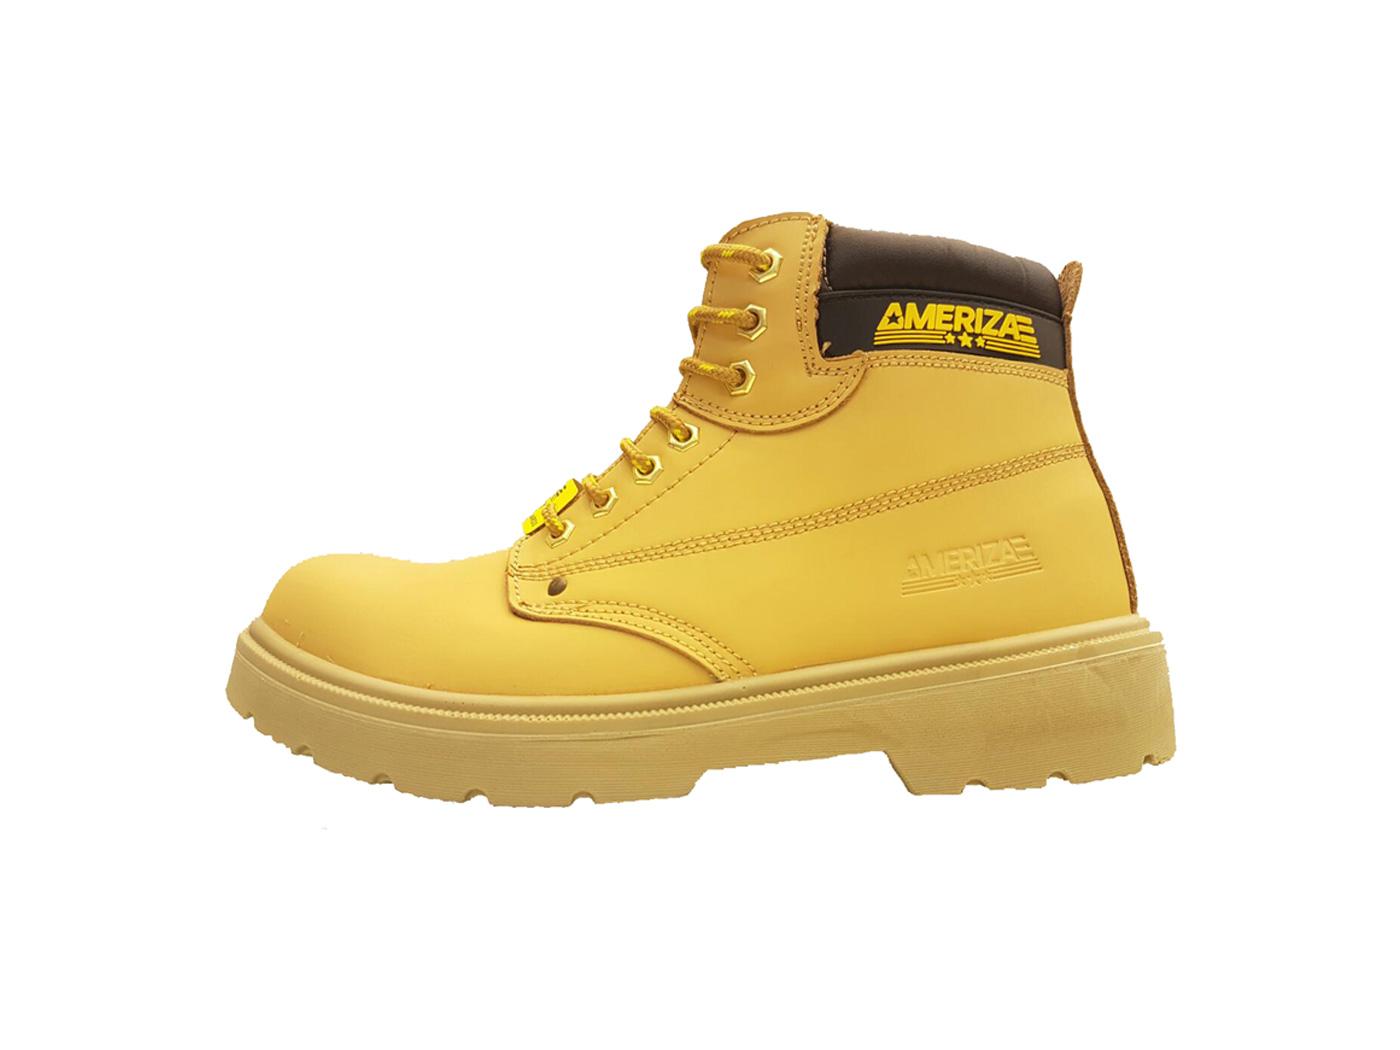 Ameriza Shoe